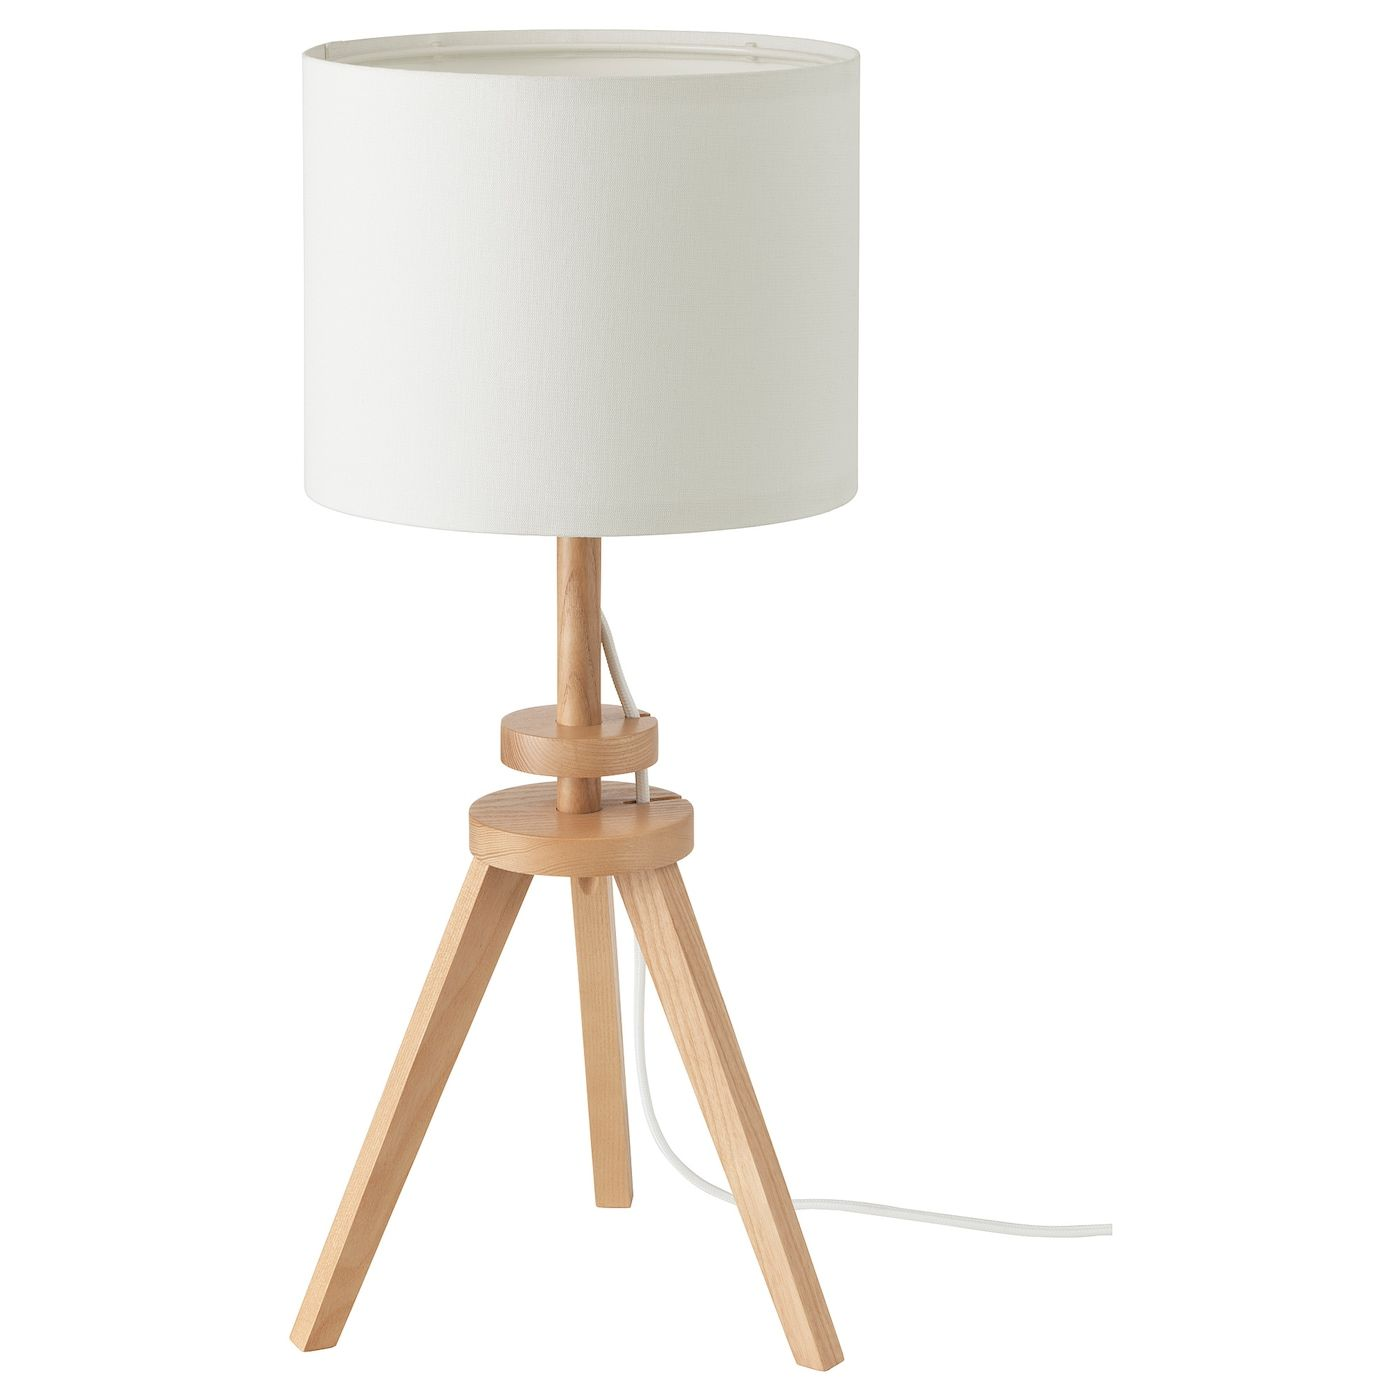 US Furniture and Home Furnishings | Floor lamp, Lamp